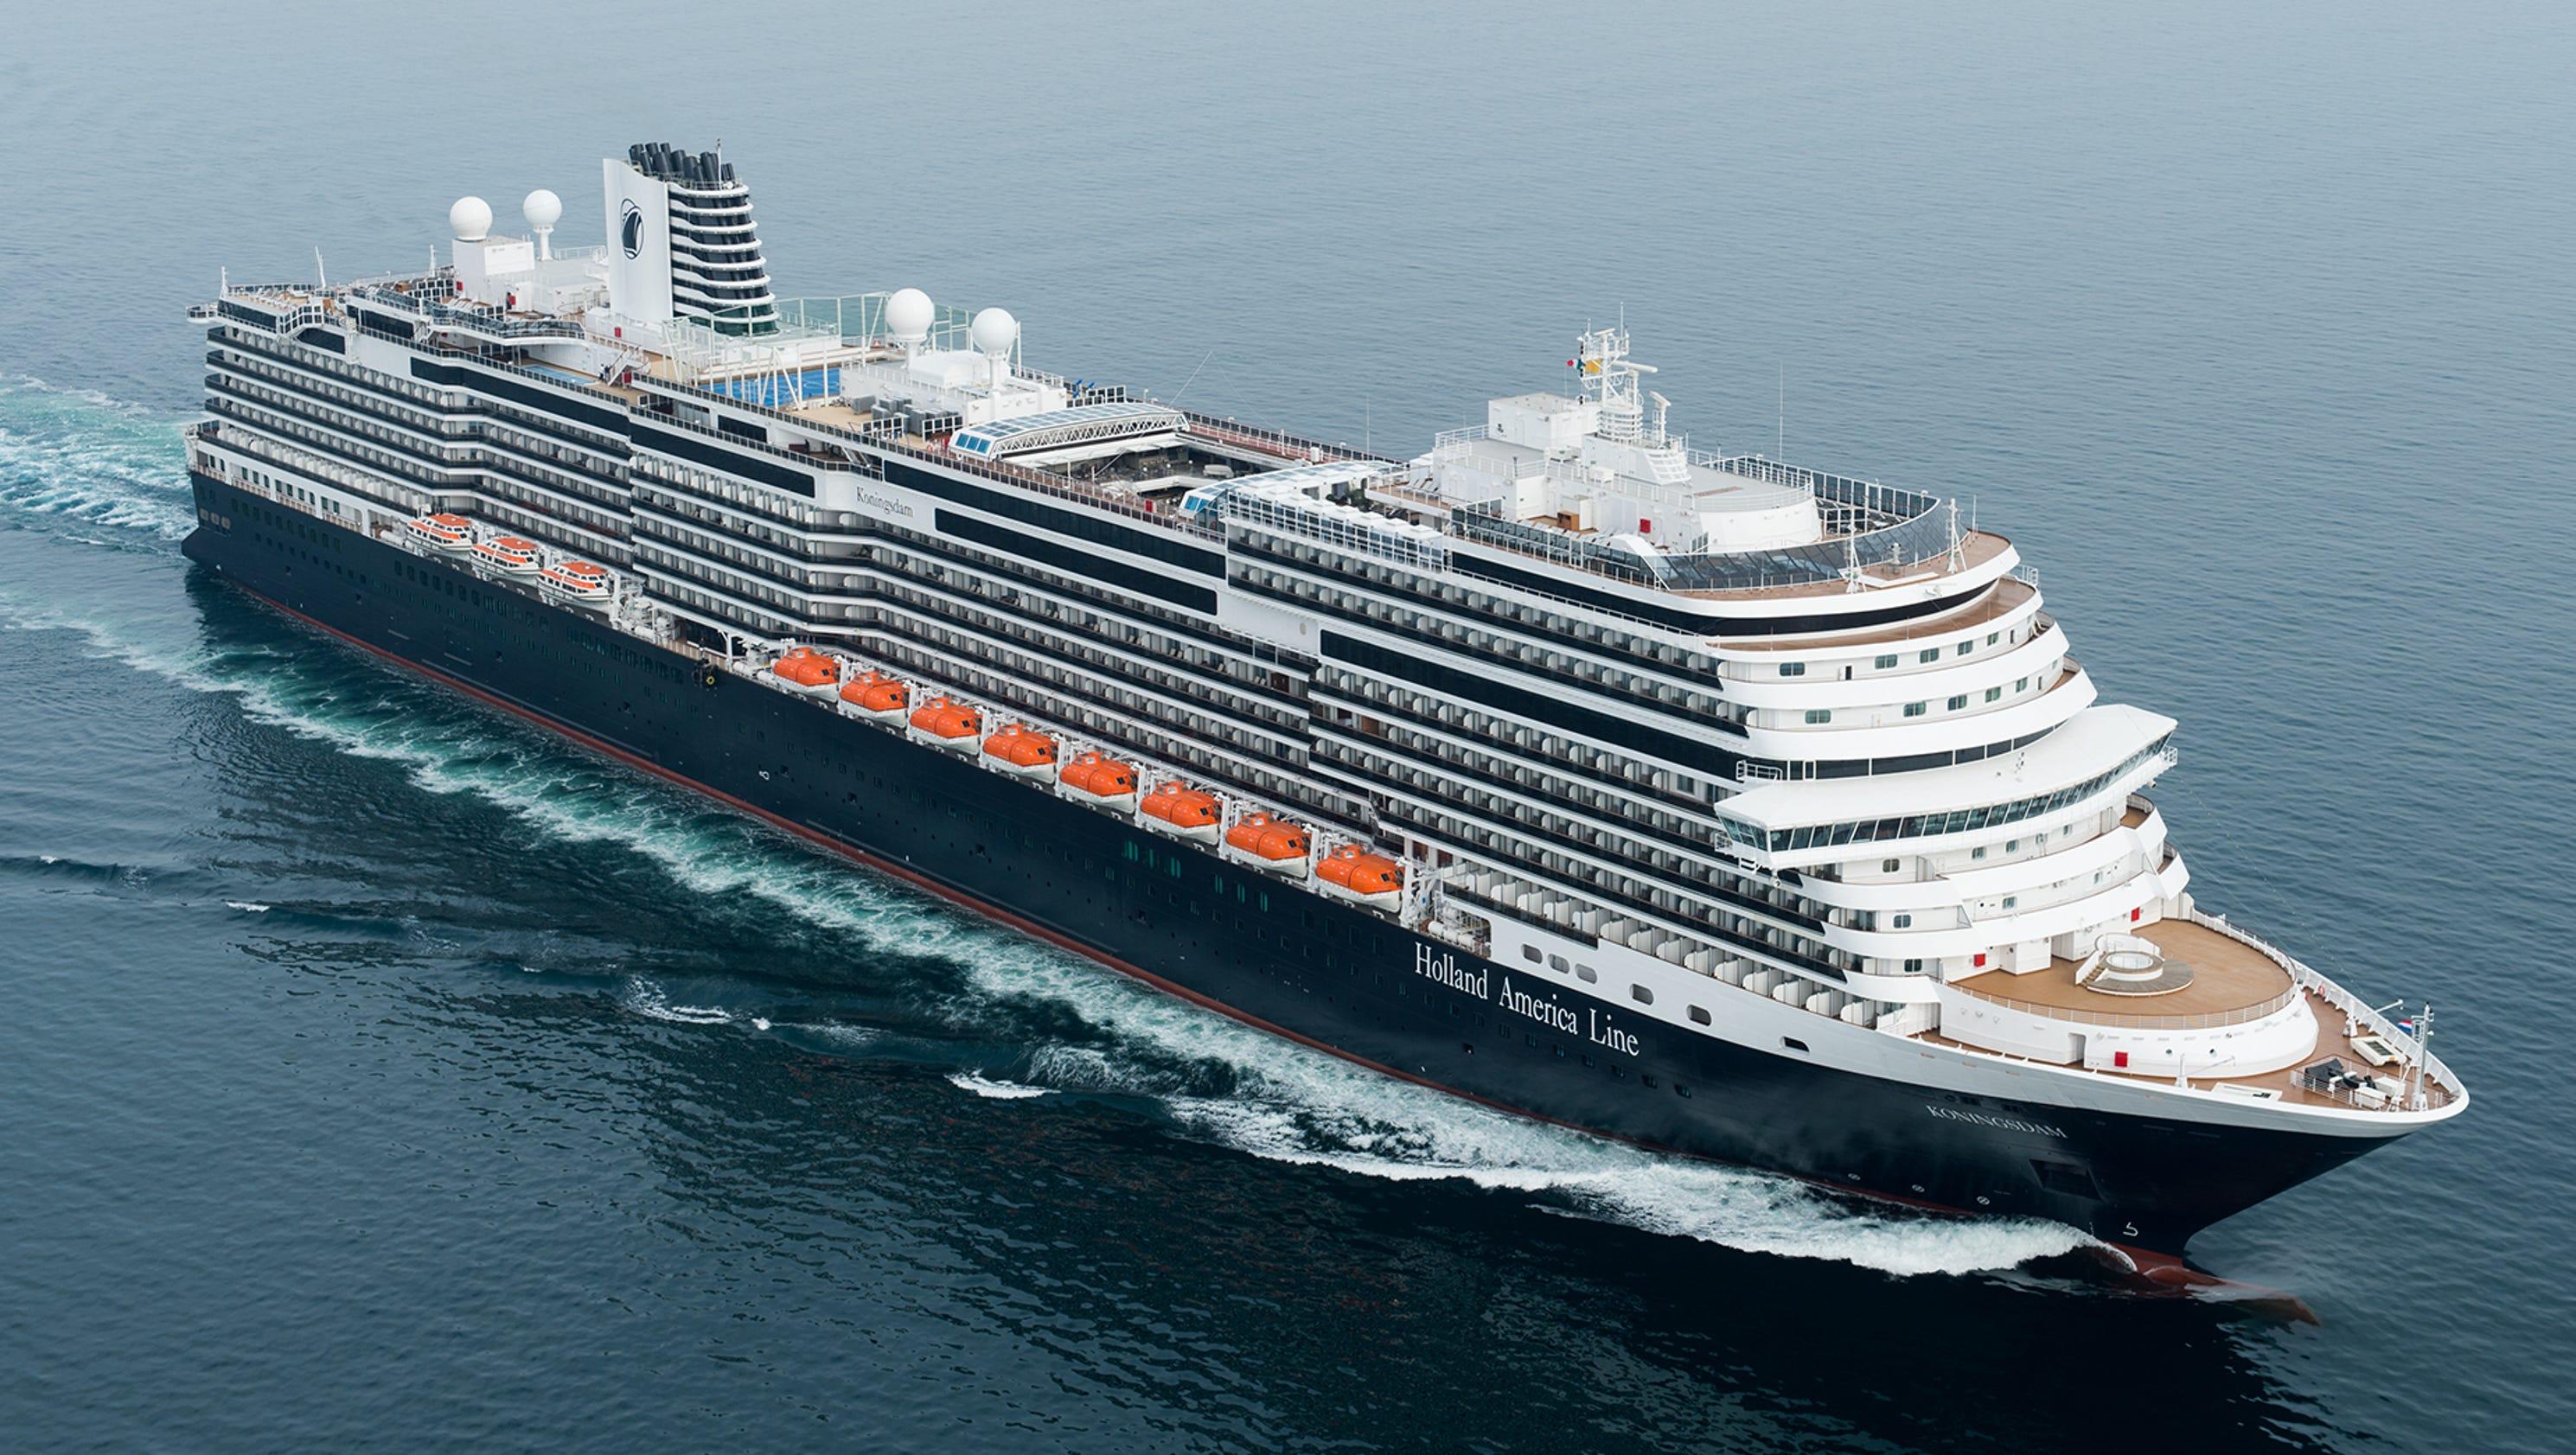 001 Koningsdamhal Credit Cruise Ship Tours Holland America